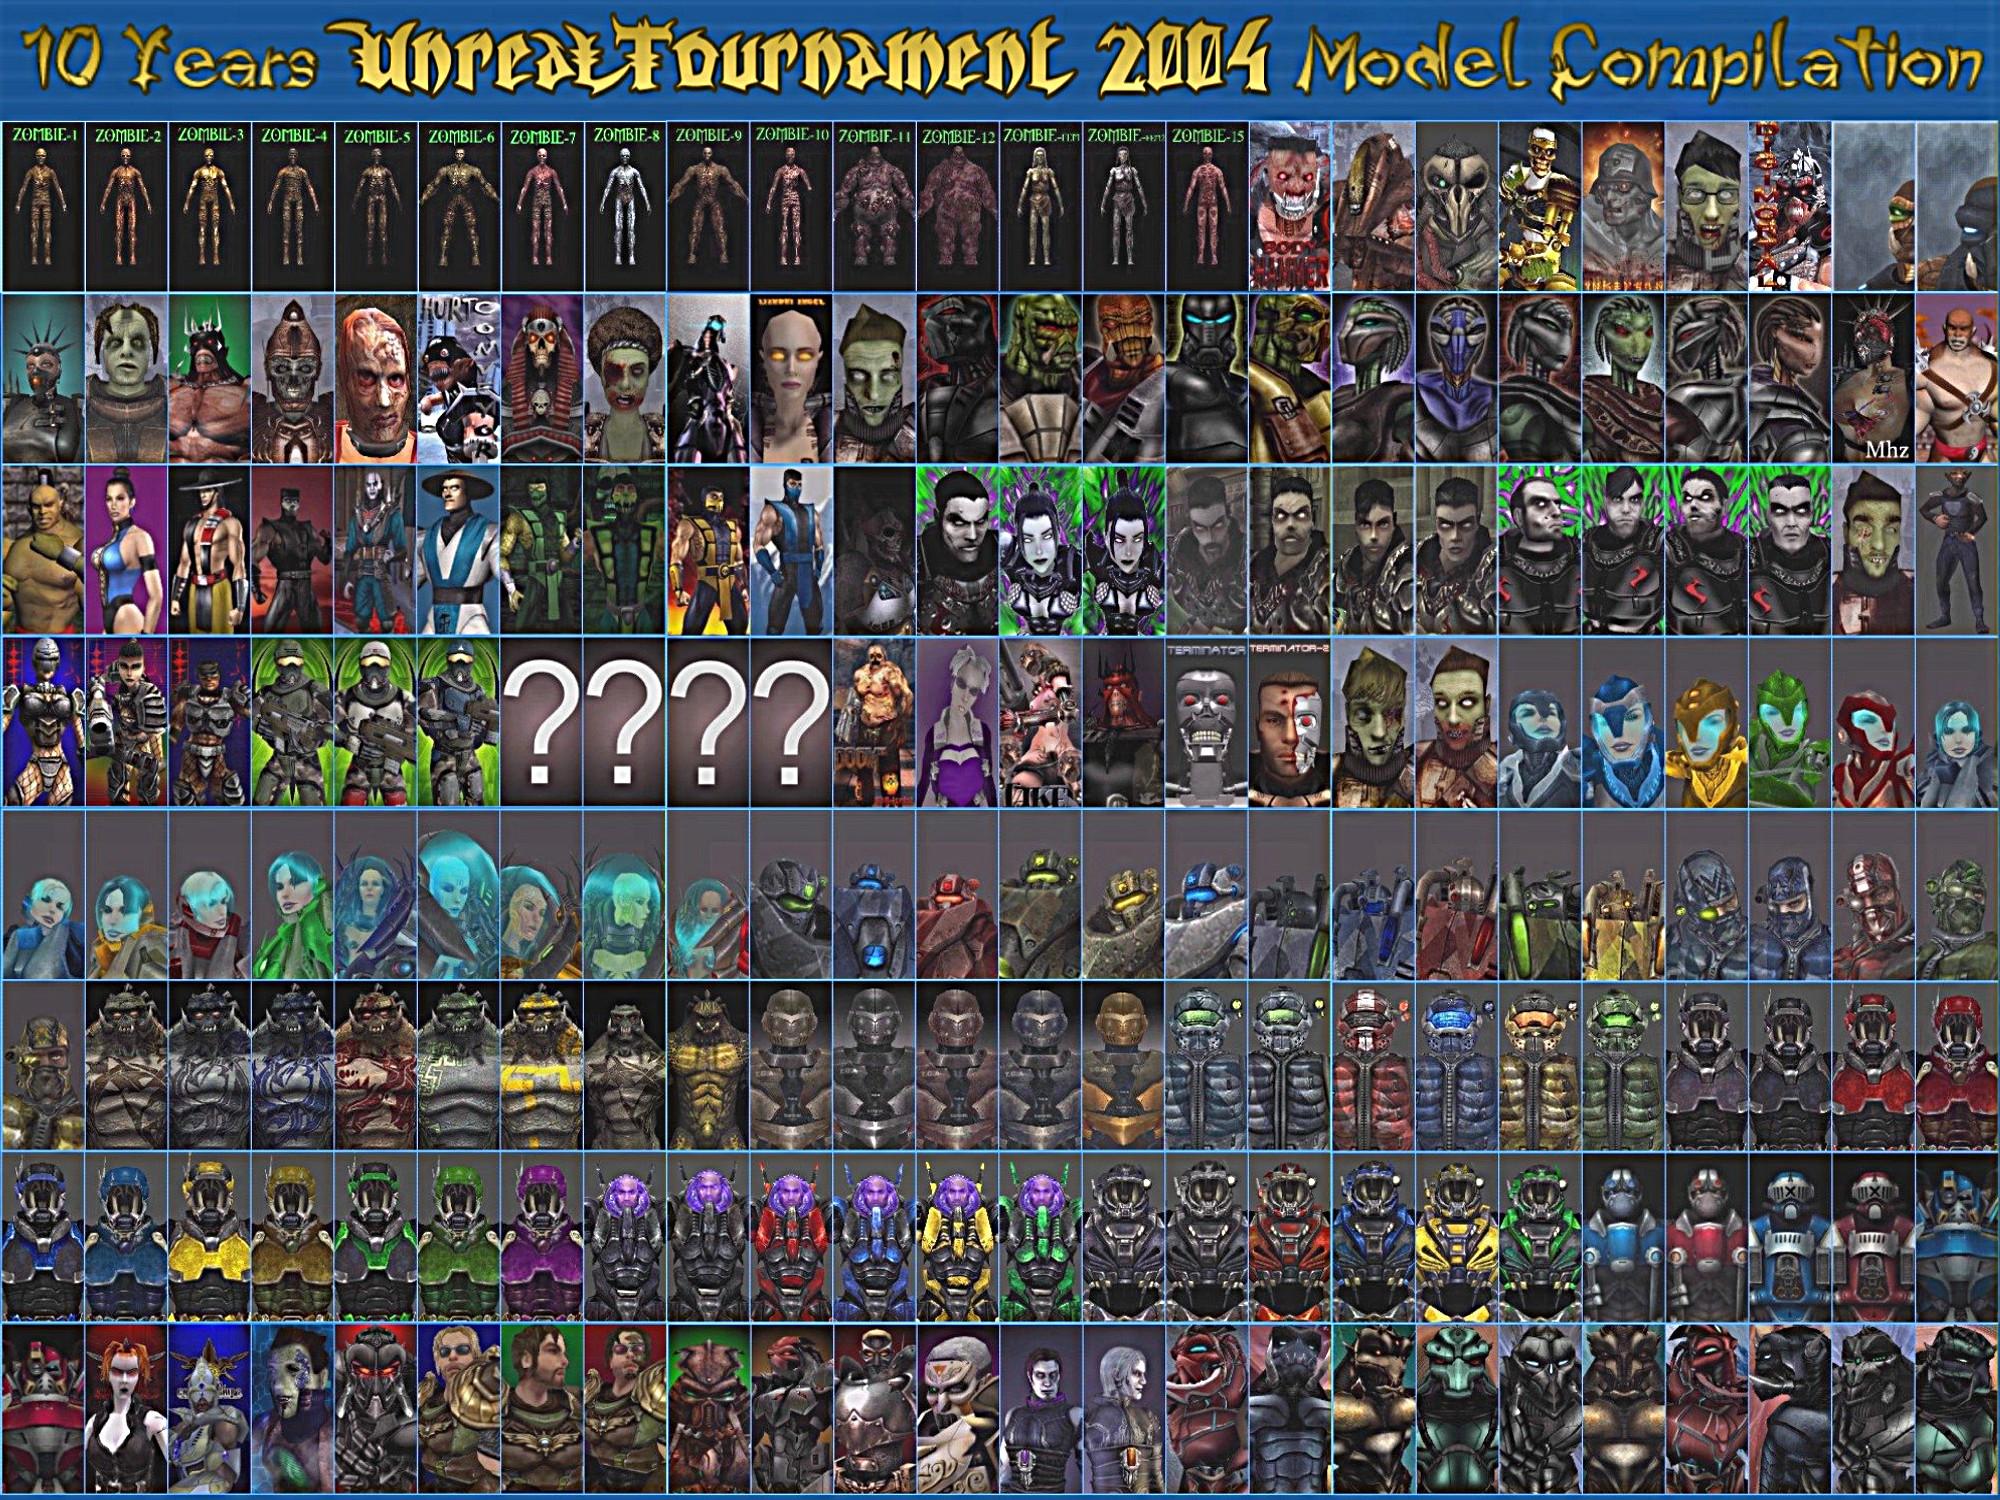 Ut2k4 anniversary model compilation addon unreal tournament 2004.